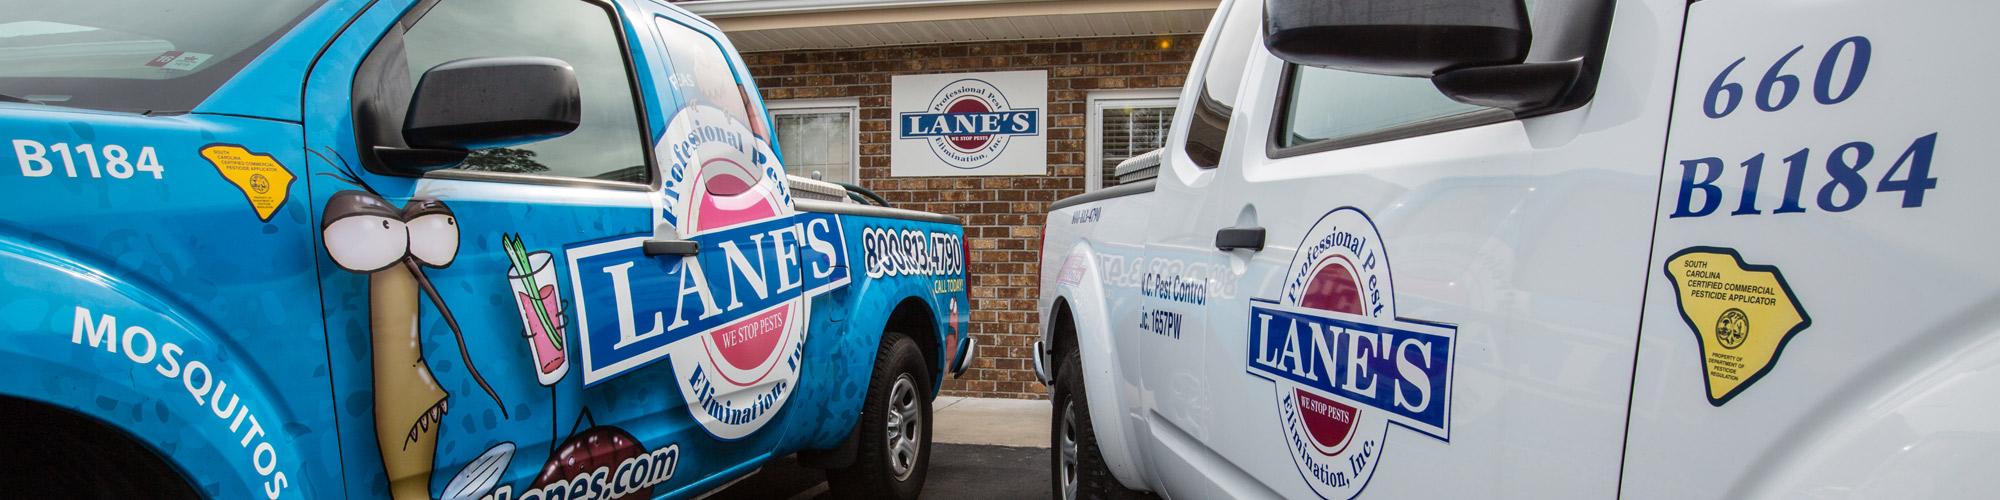 Contact Lane's